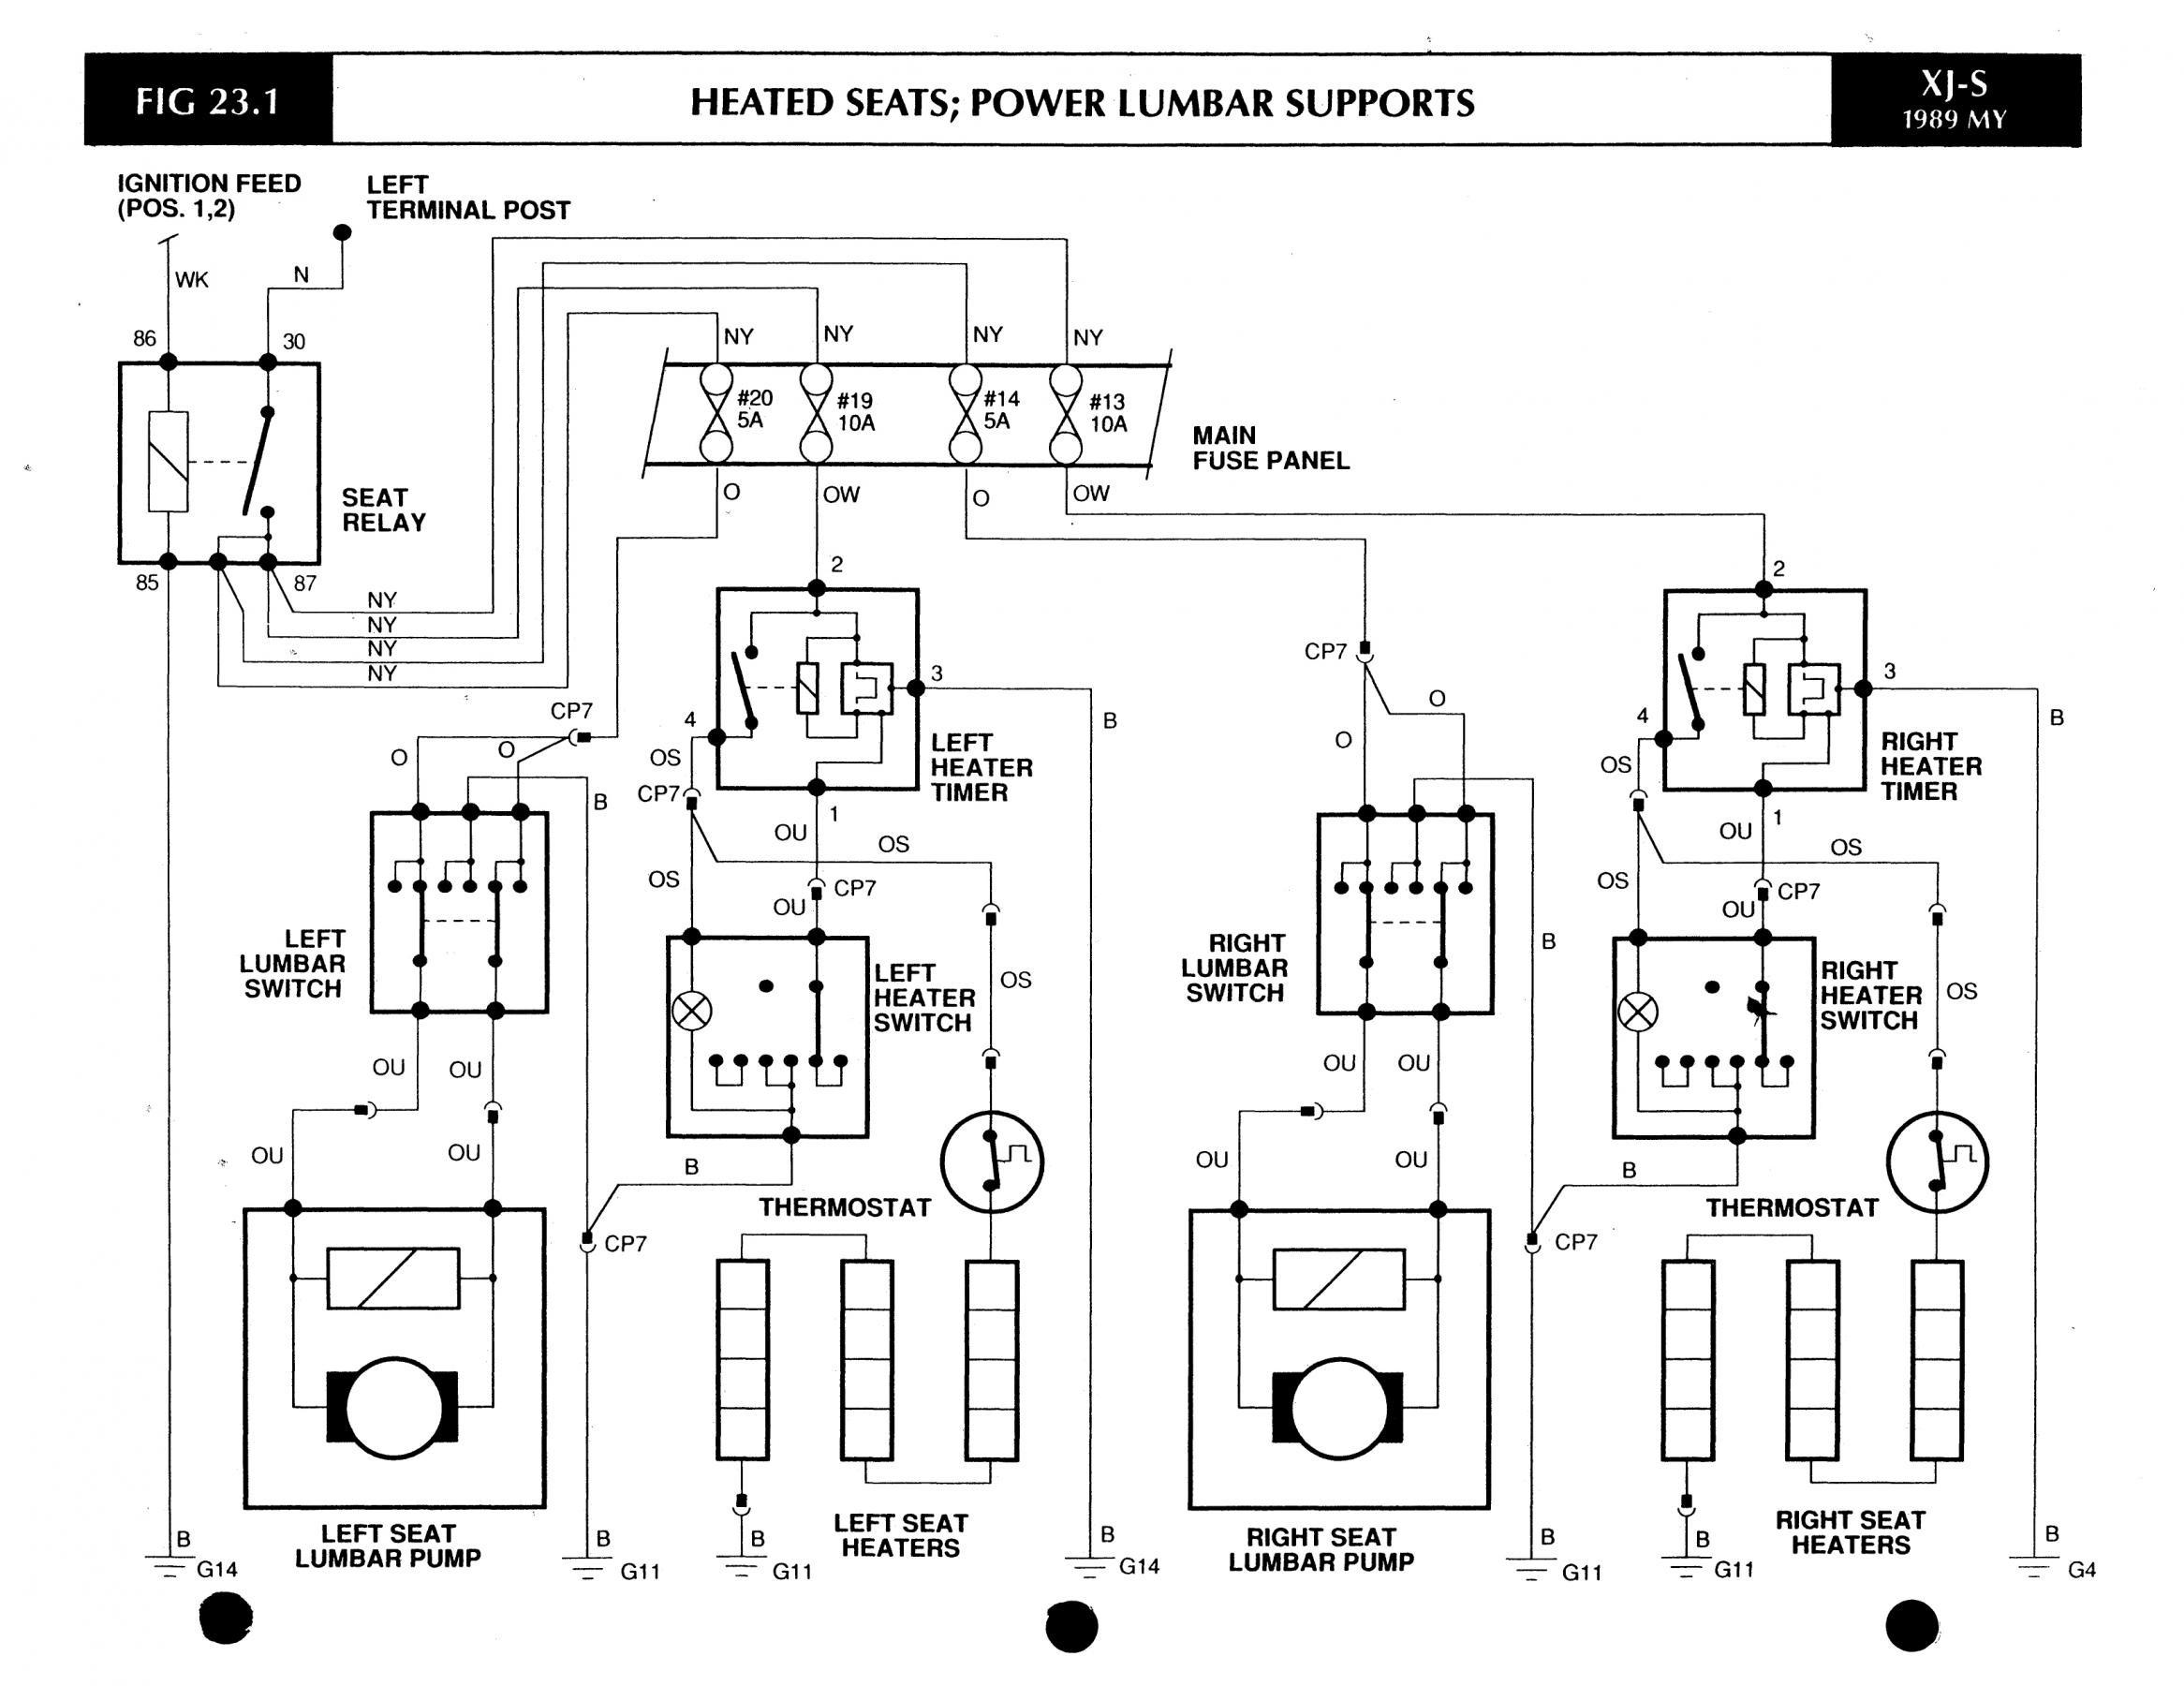 Kdc 255u Wiring Diagram E91 T45 Transmission Wiring Harness Diagram Of Kdc 255u Wiring Diagram